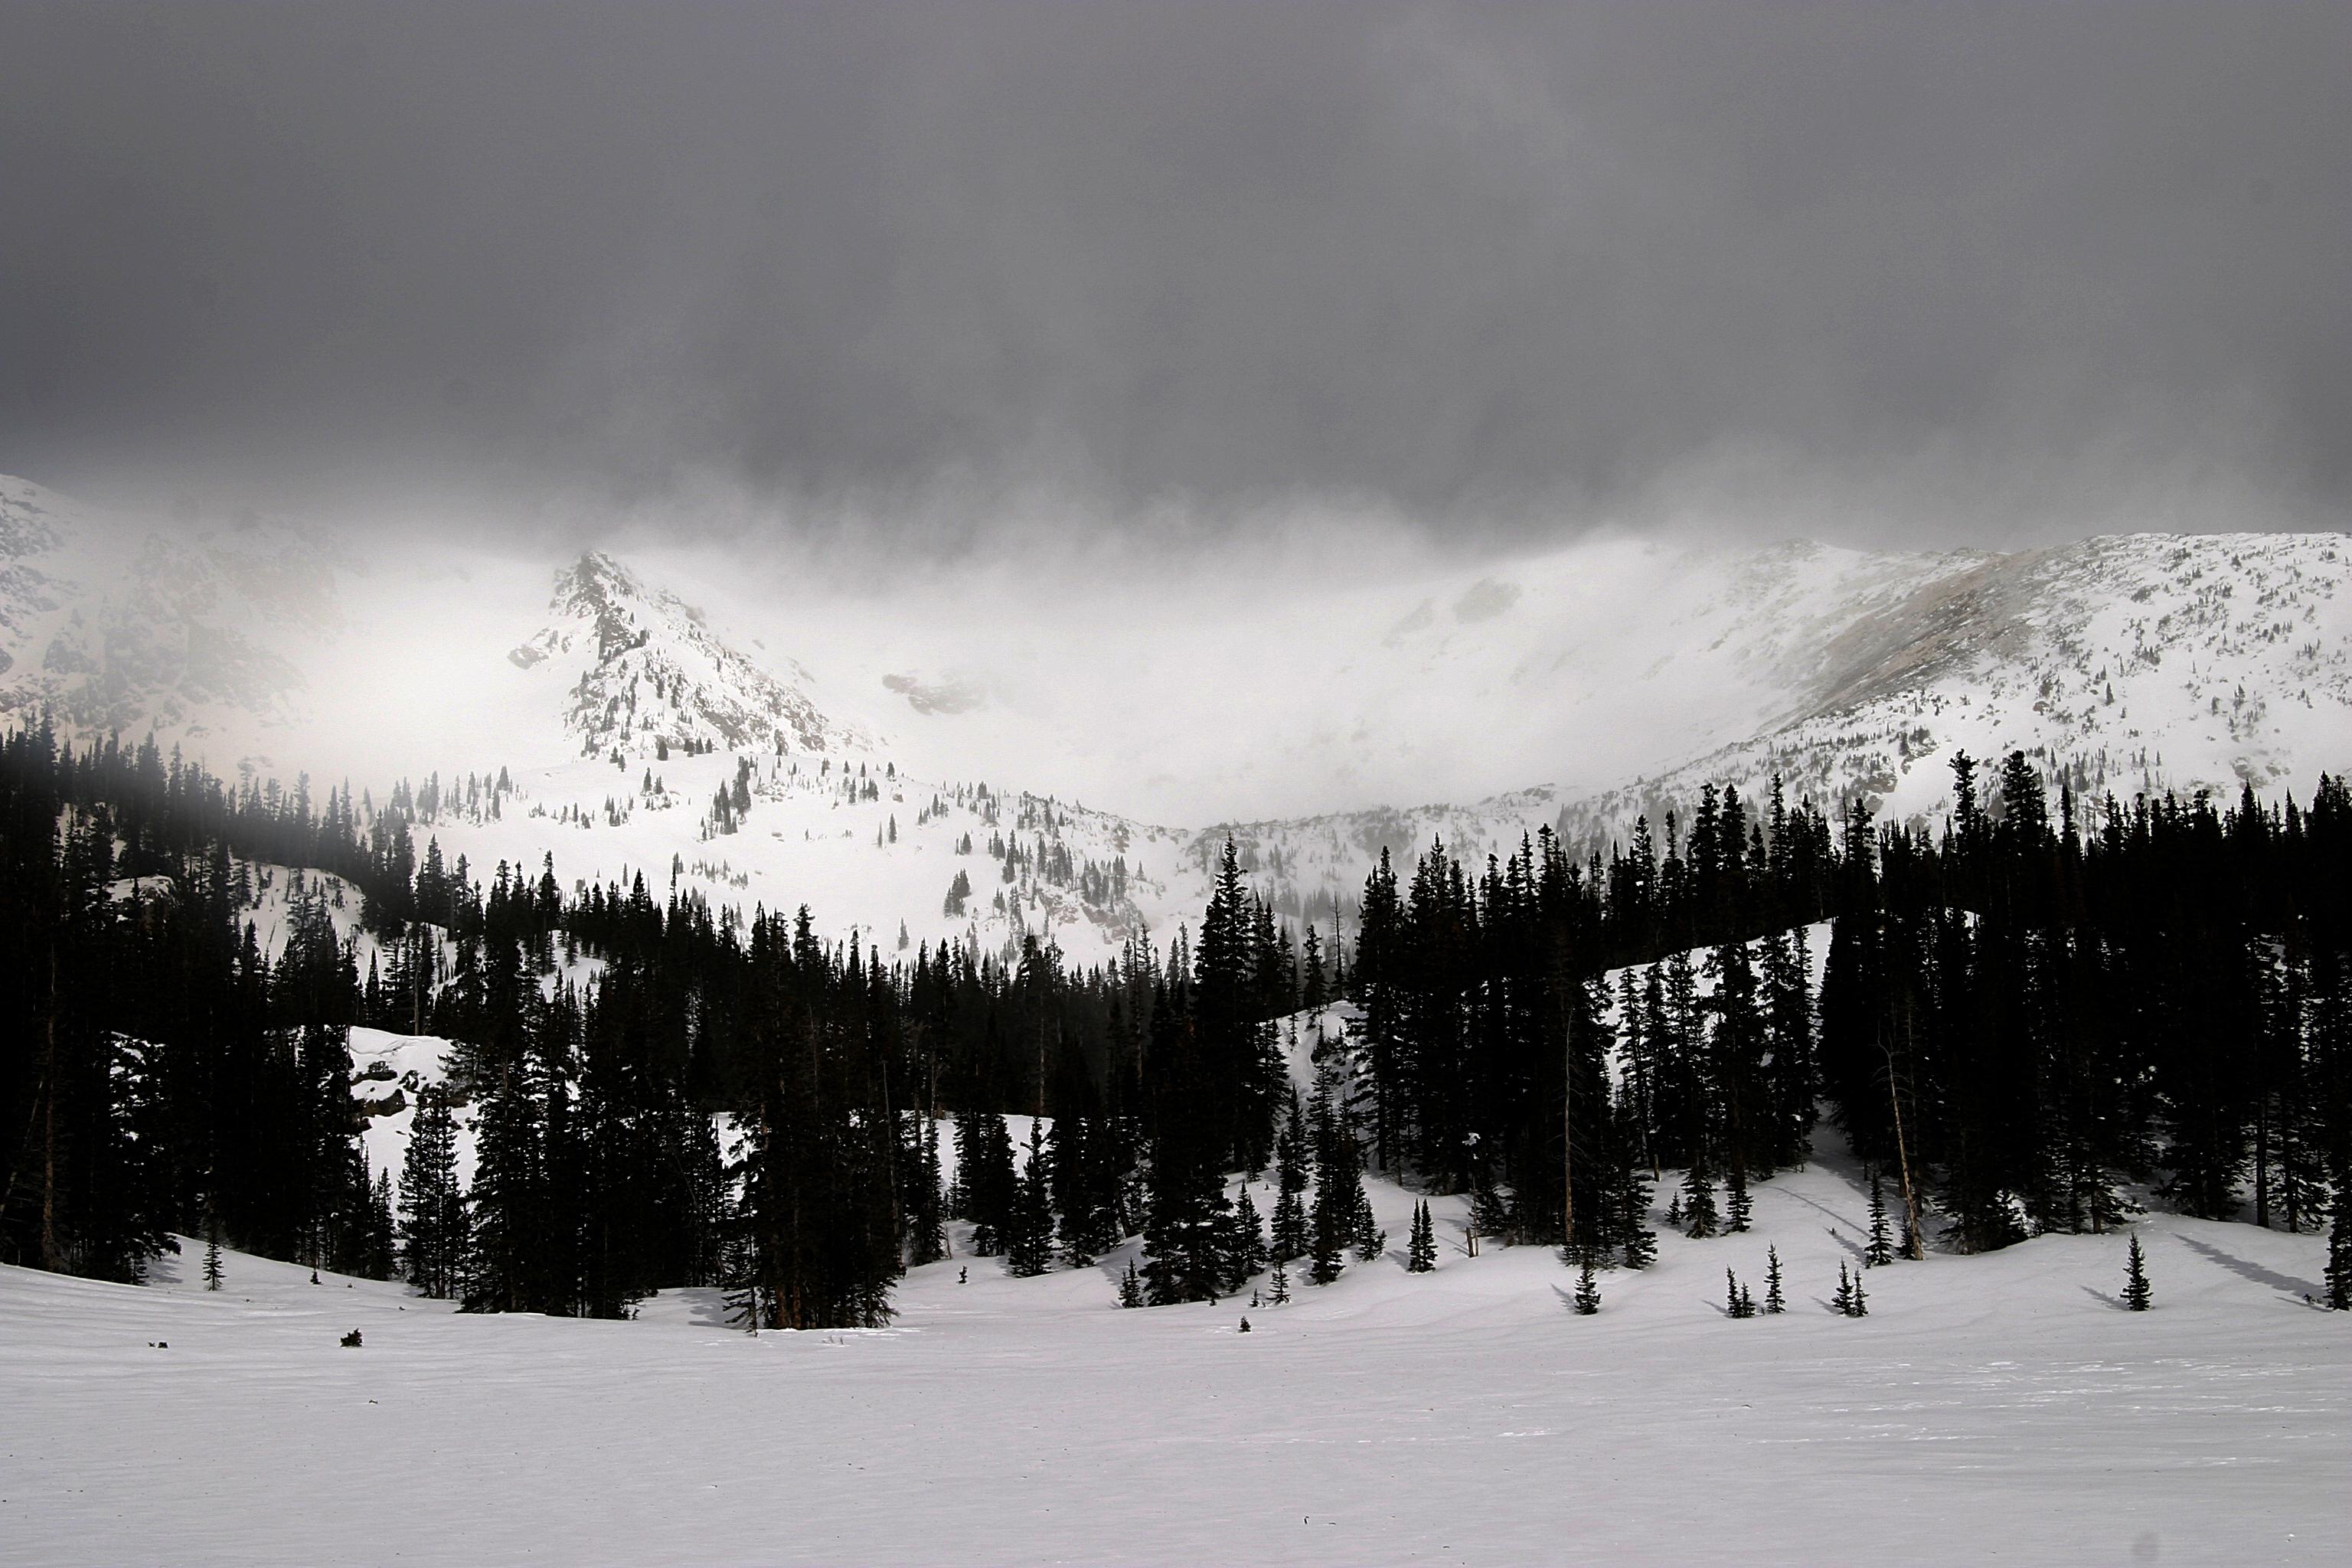 Black Aesthetic Wallpaper File Snowy Mountains Jpg Wikimedia Commons